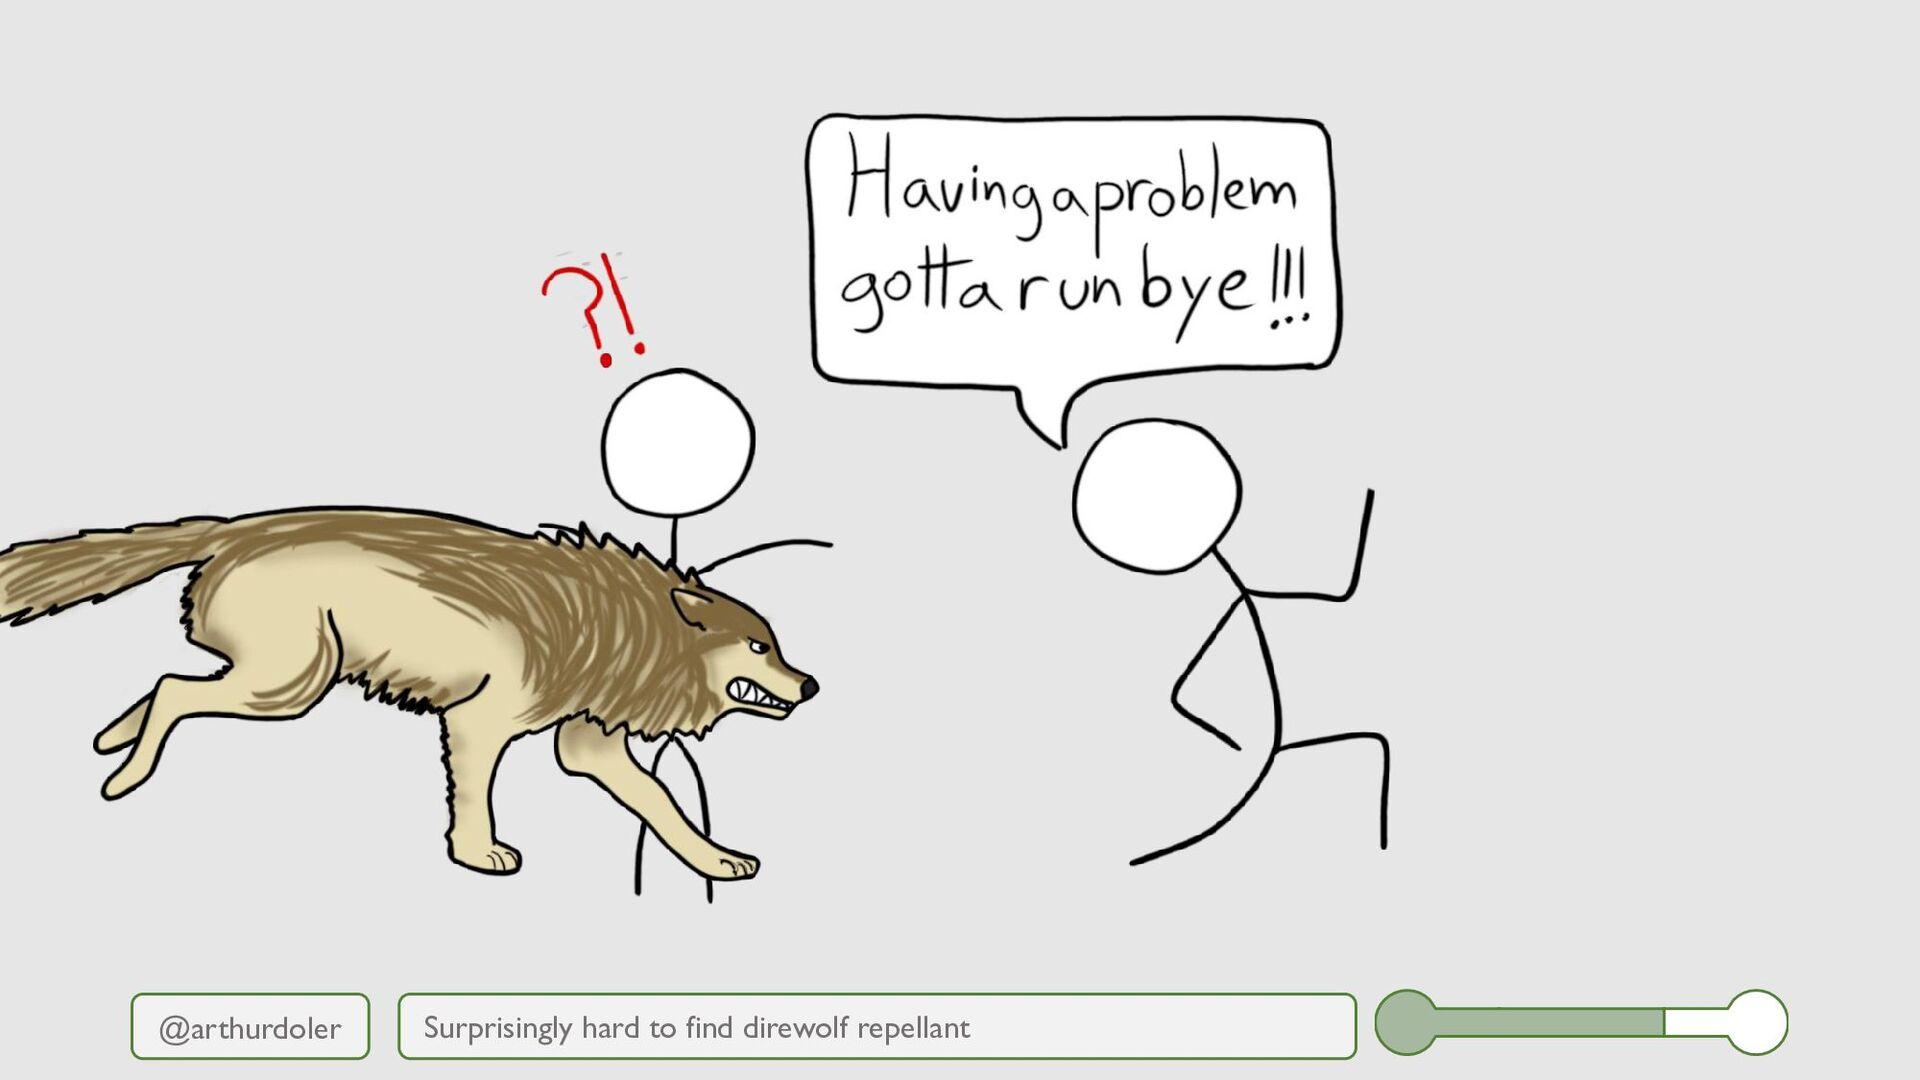 @arthurdoler Surprisingly hard to find direwolf...